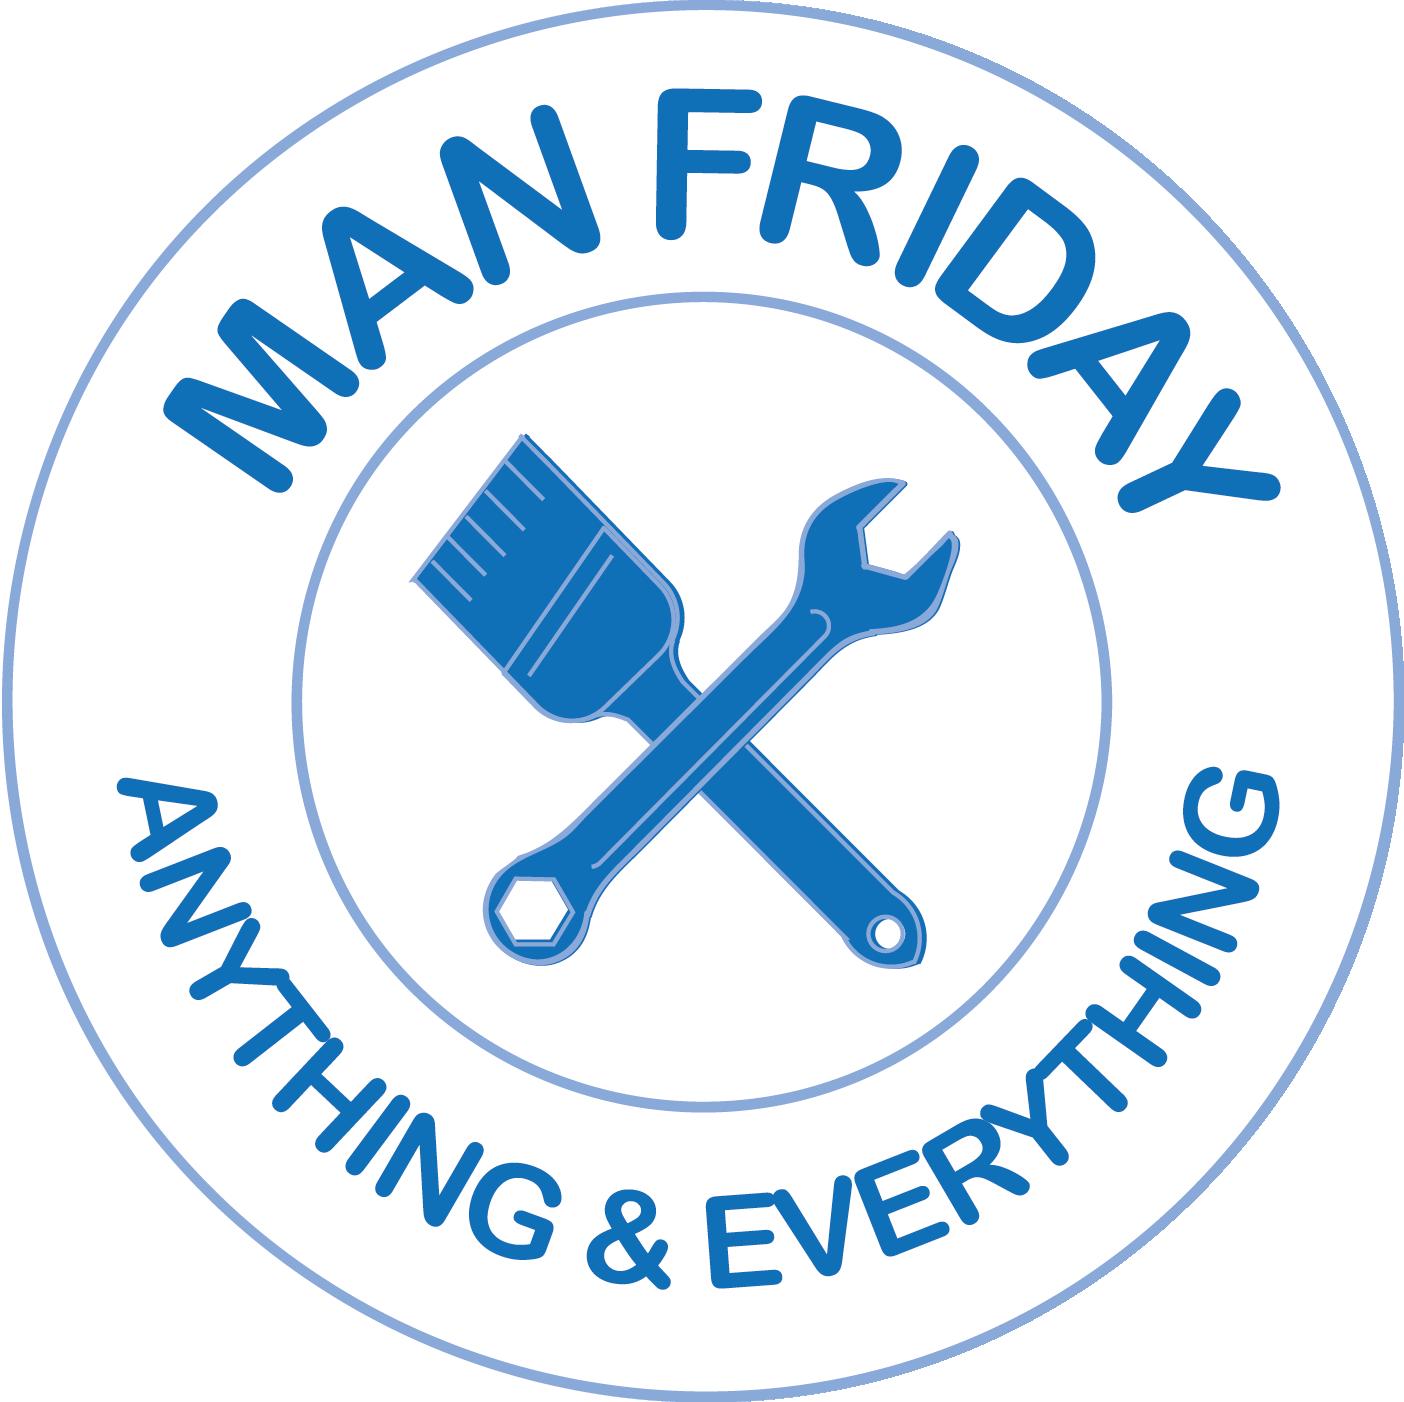 Man Friday Logo v.2, Designed by Bertha Lee